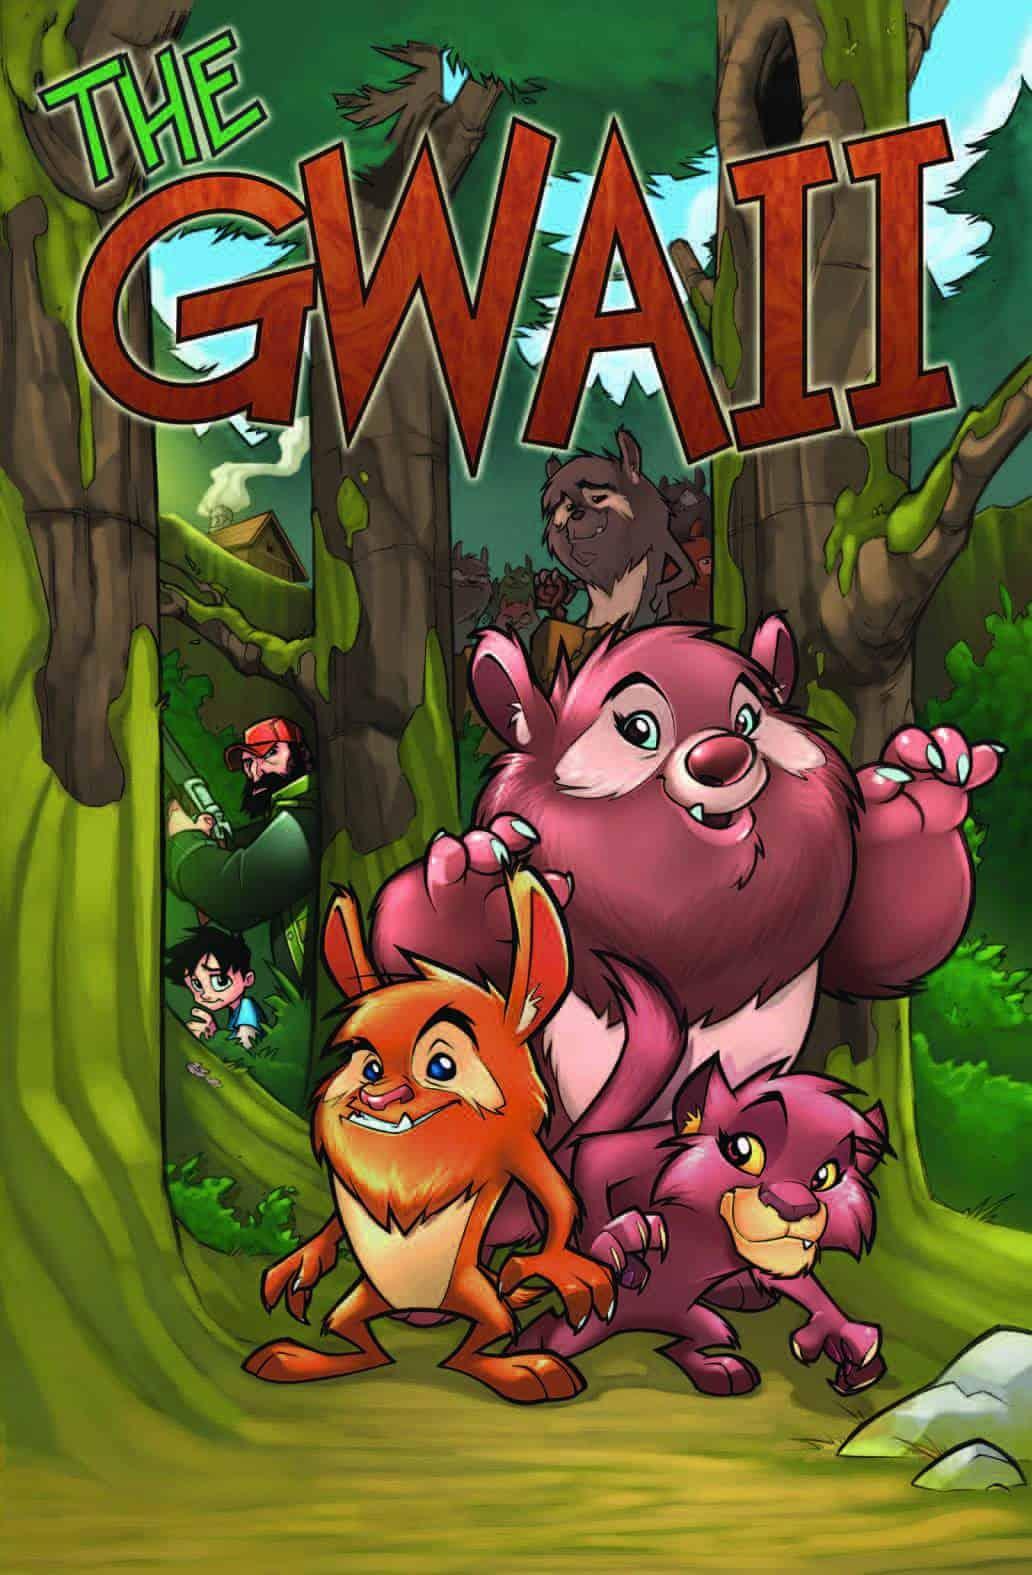 The Gwaii 2